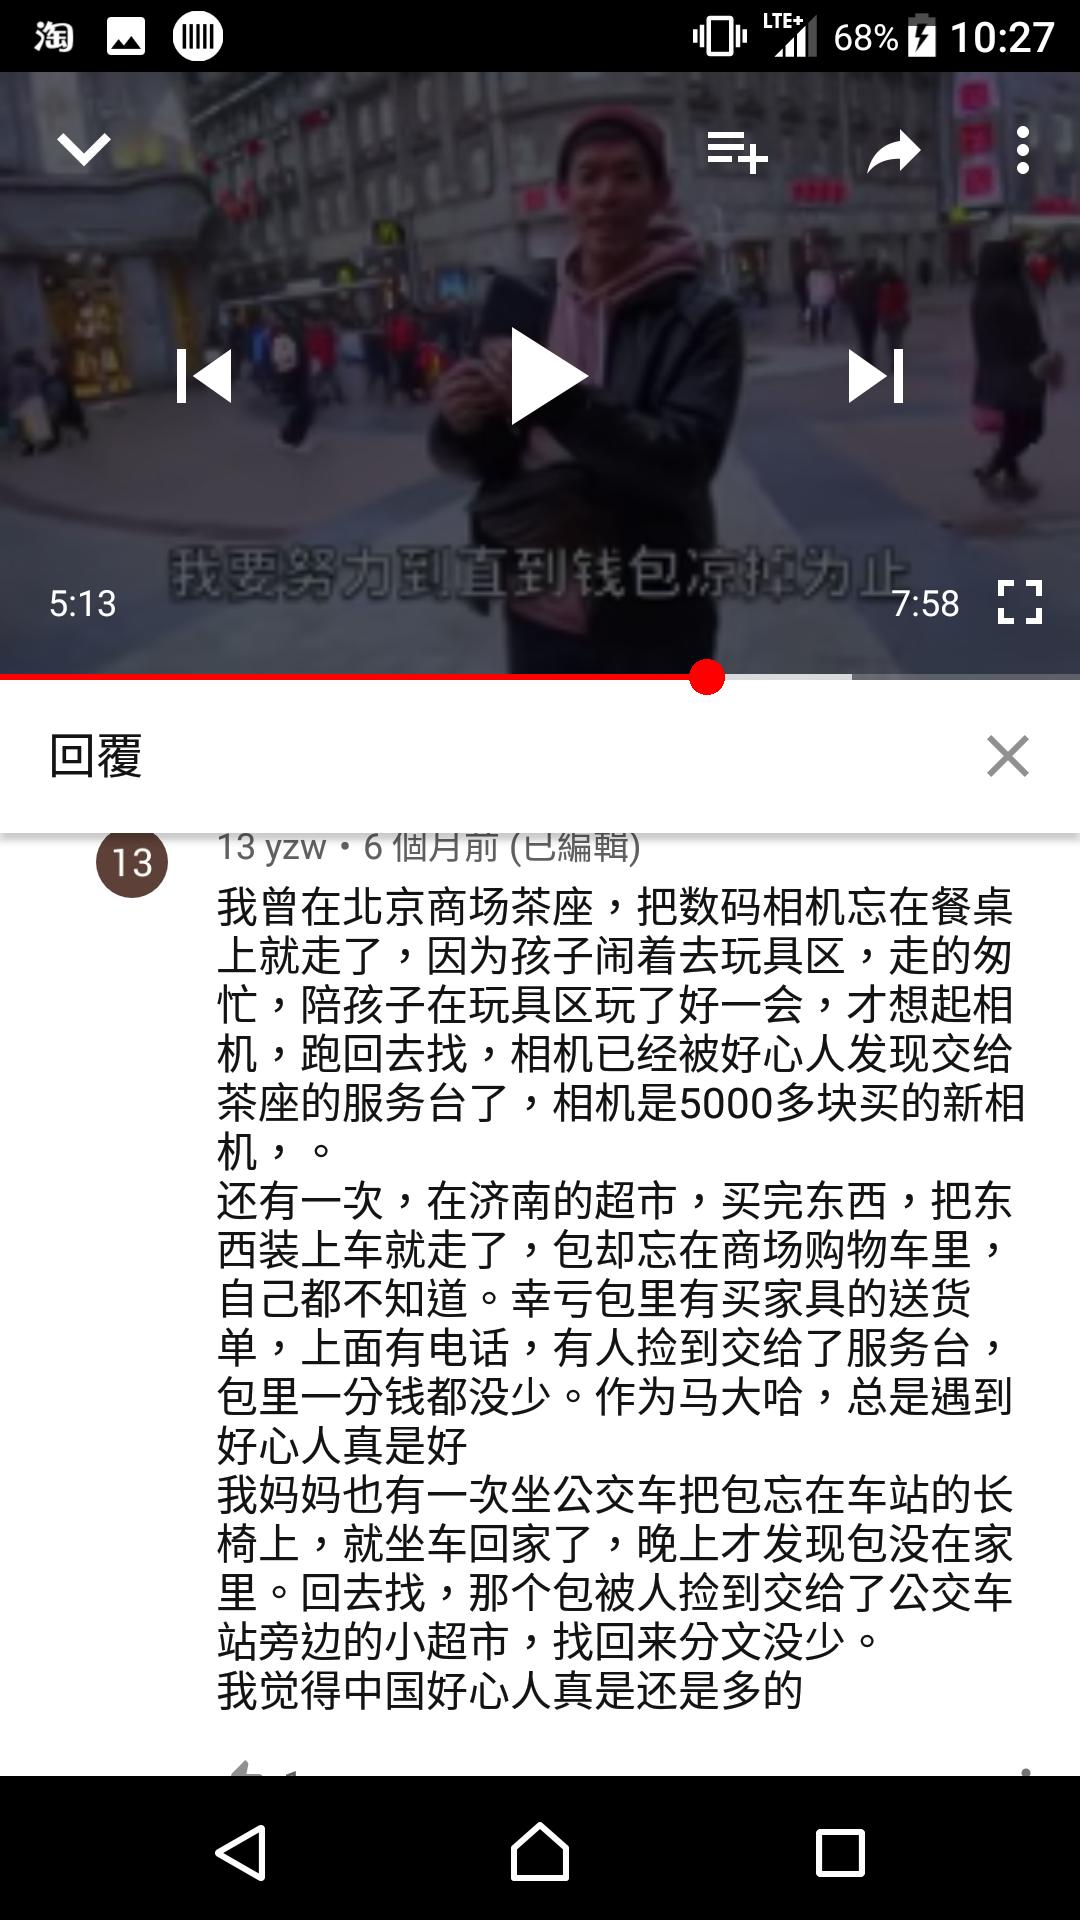 [img]https://upload.cc/i1/2018/12/28/LsBntJ.png[/img]